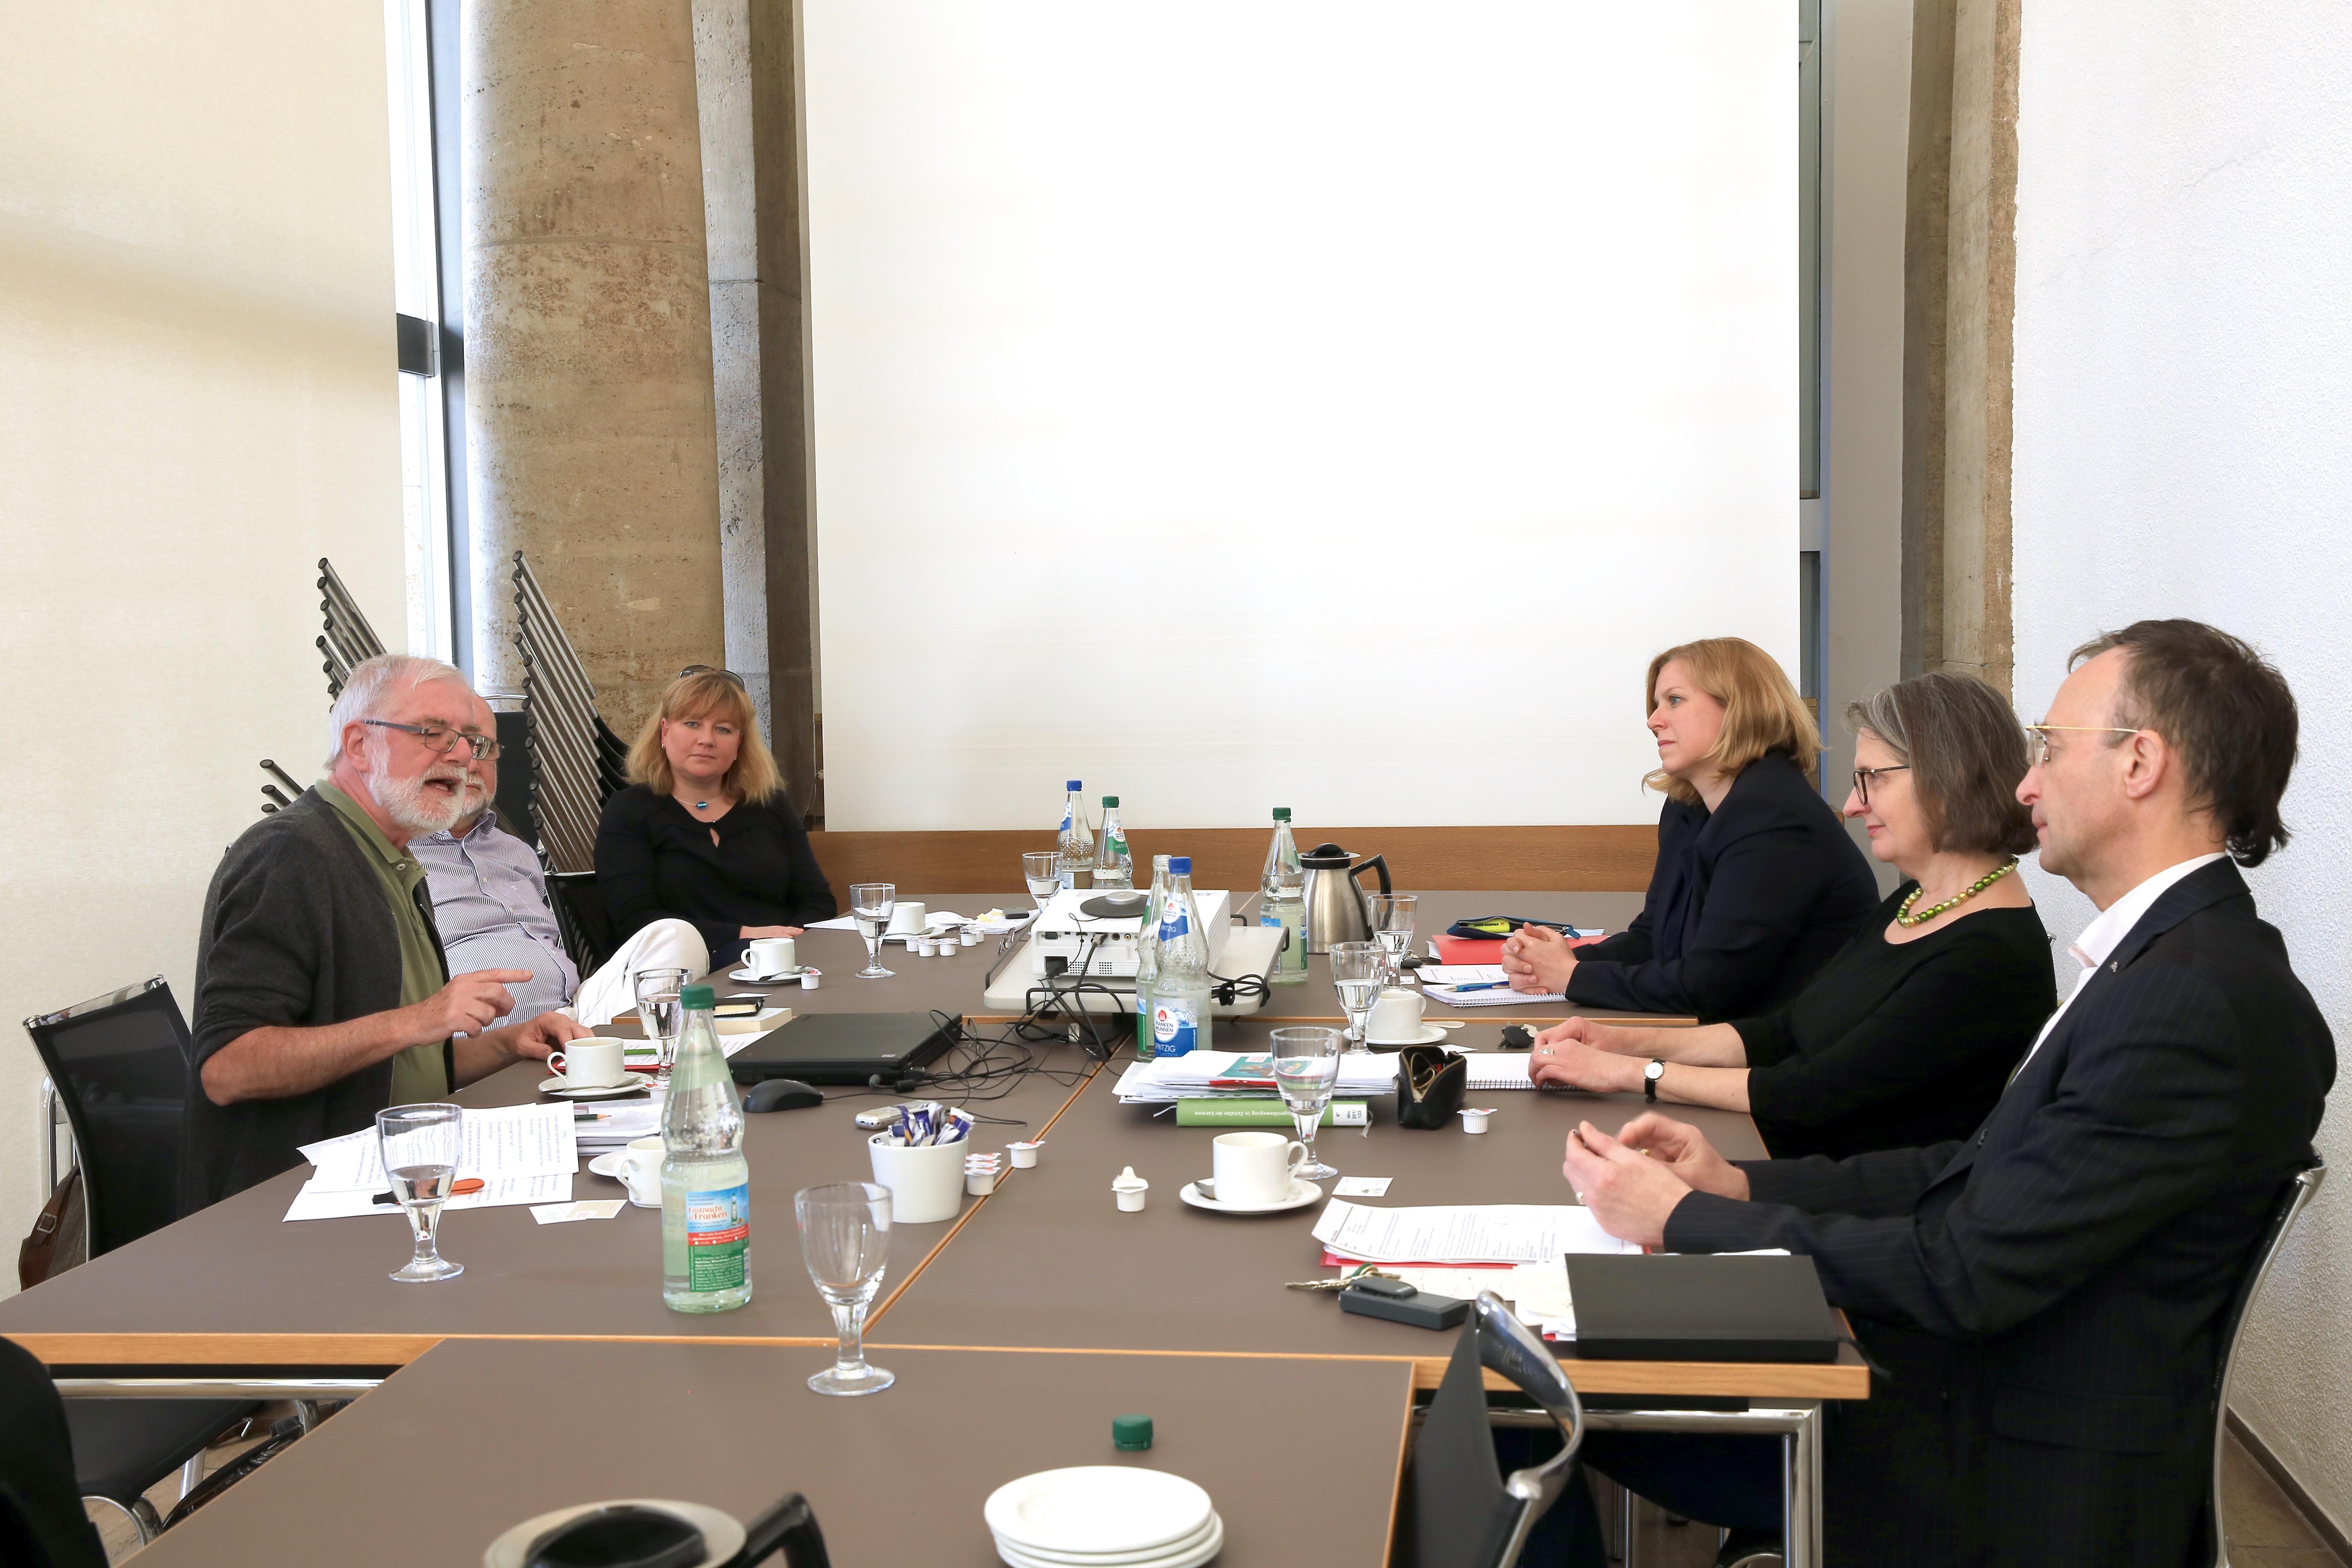 Von links: Ulrich Grober, Dr. Thomas Brehm (verdeckt), Dr. Sonja Misfeldt, Barbara Leven, Dr. Claudia Selheim, Dr. Frank Matthias Kamel © Wandermagazin, M. Sänger